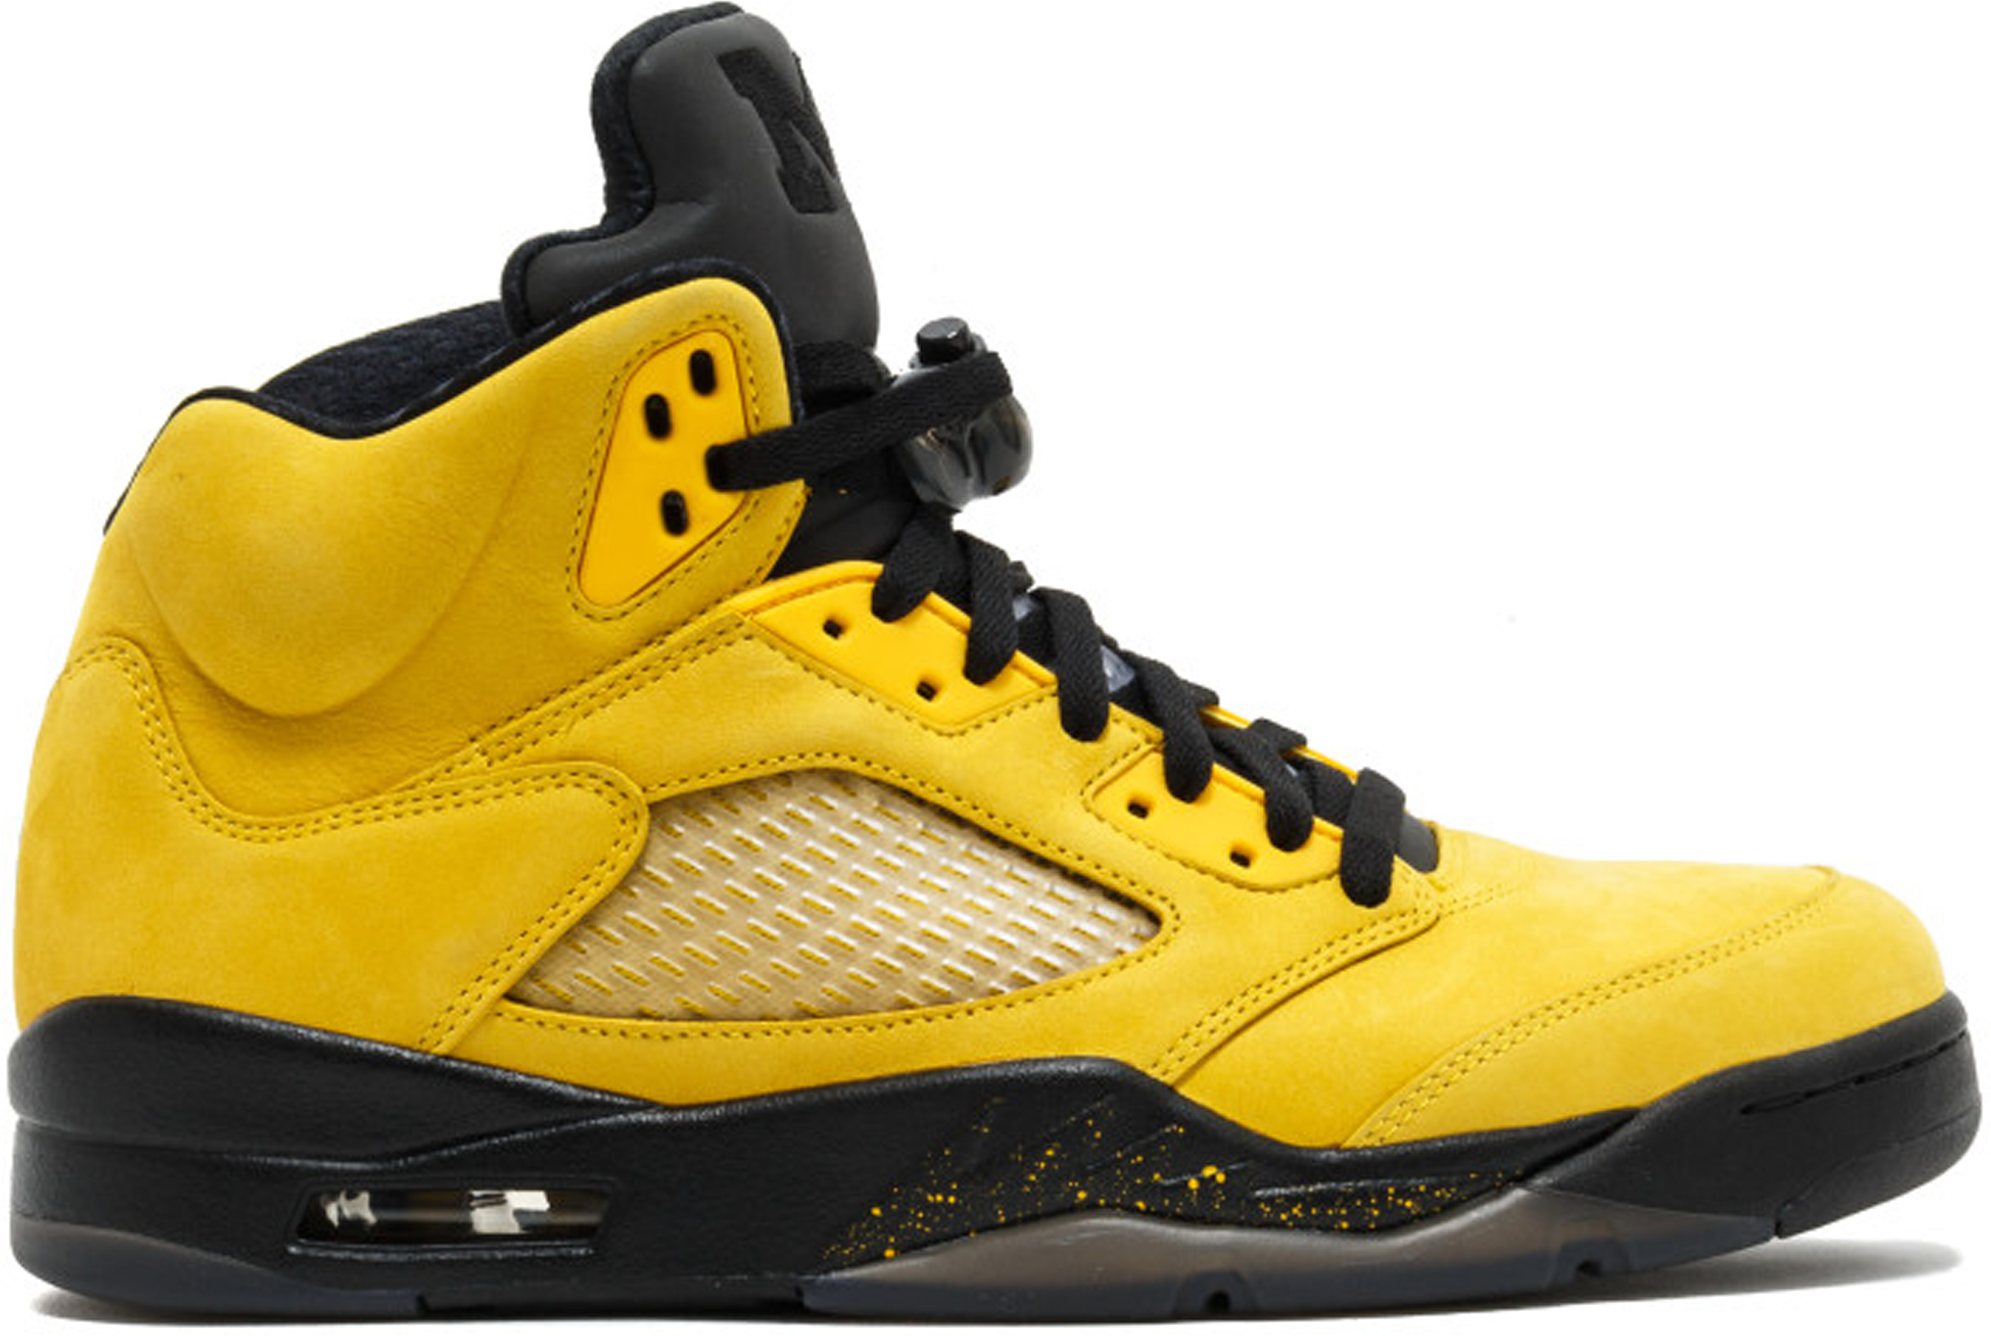 Air Jordan Shoes Average Sale Price